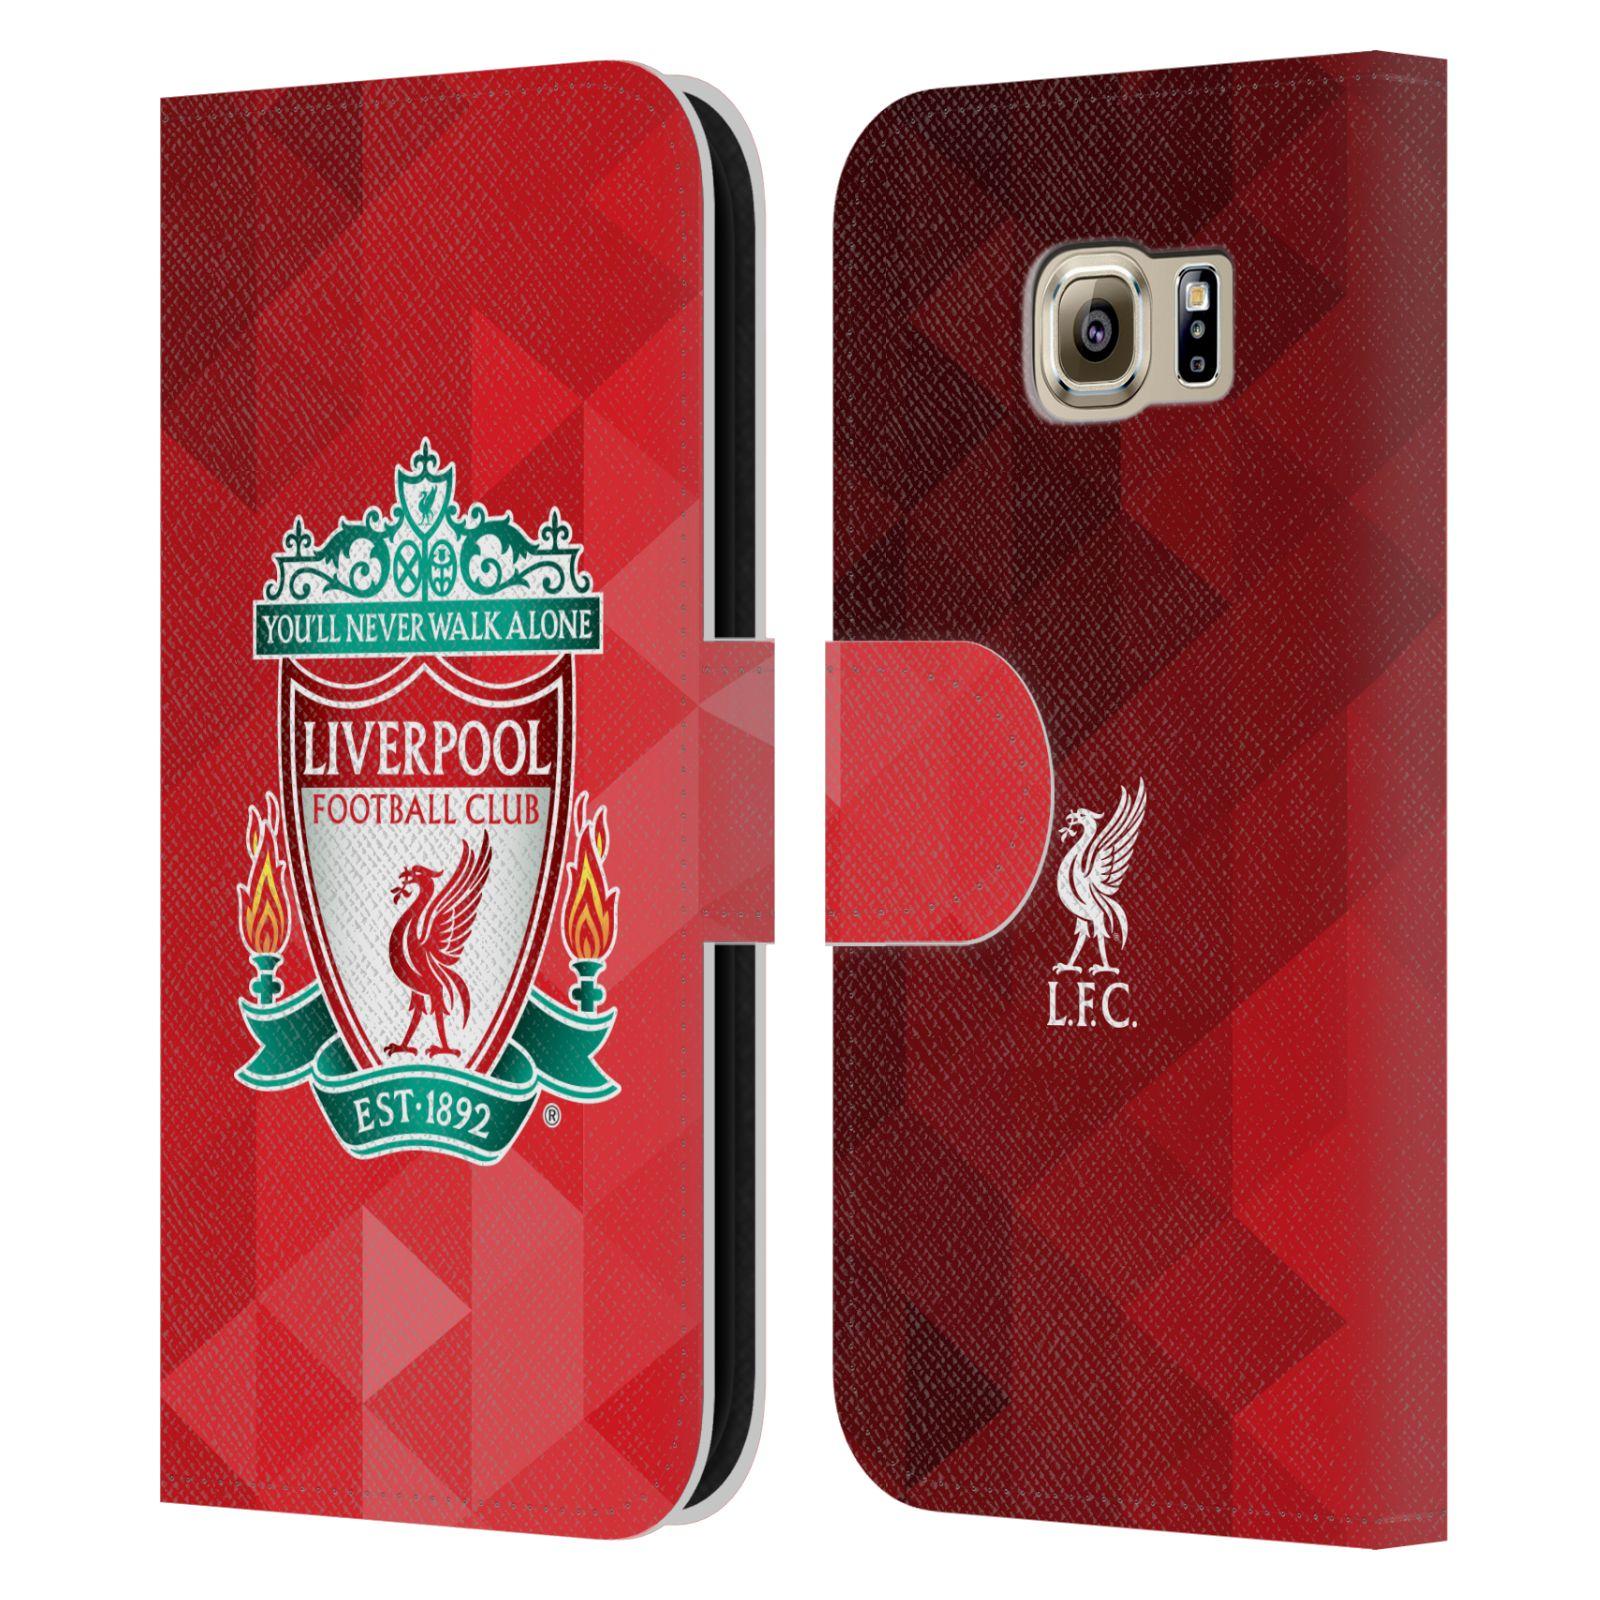 samsung s8 plus phone case liverpool